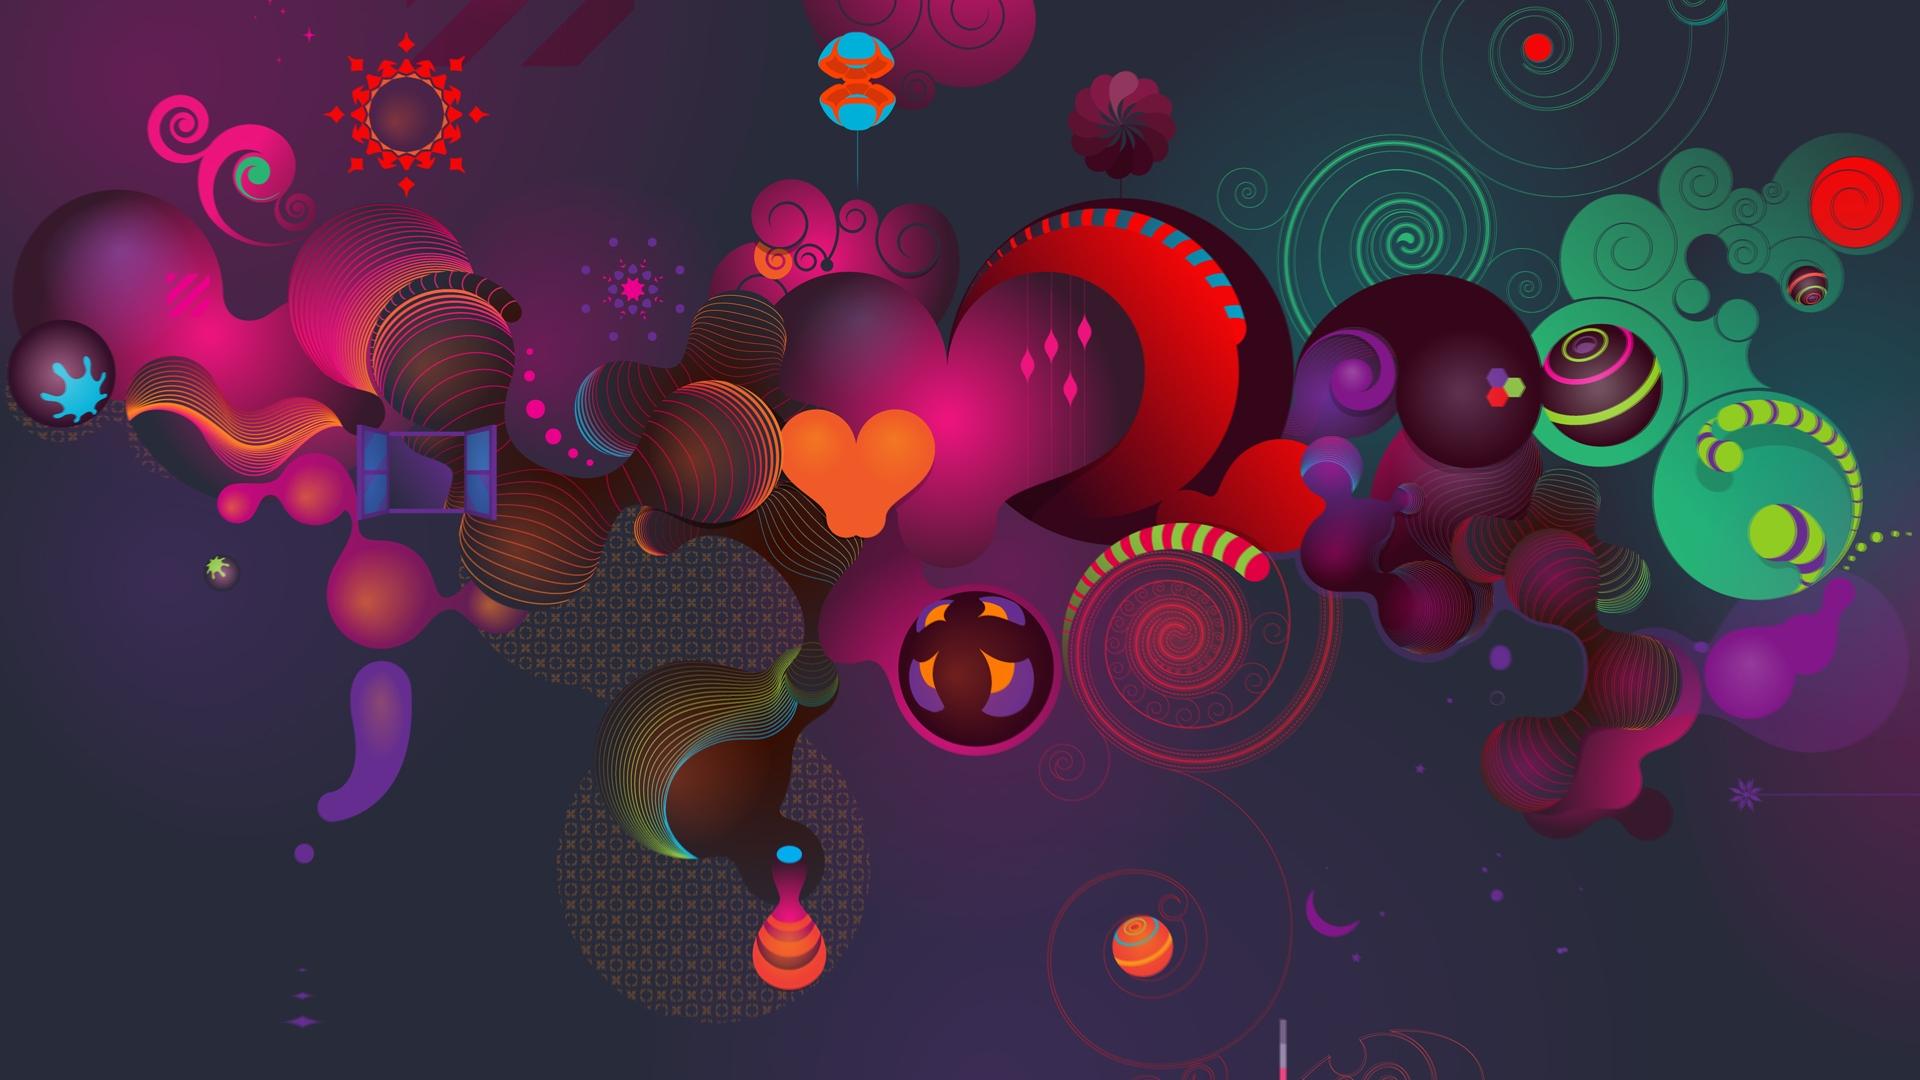 Abstract-Cartoon-Wallpaper